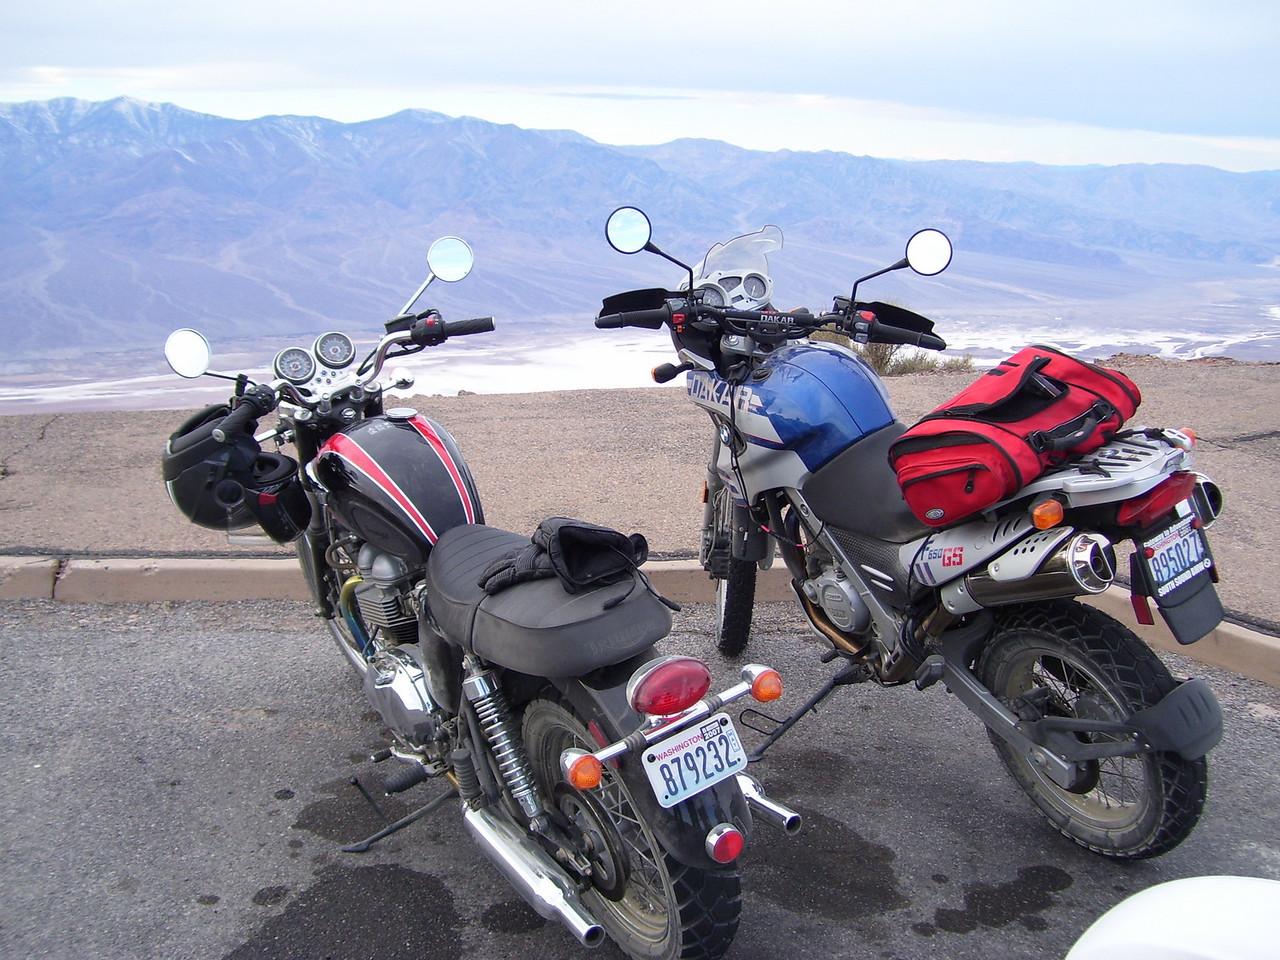 Dantes View, 5475 ft